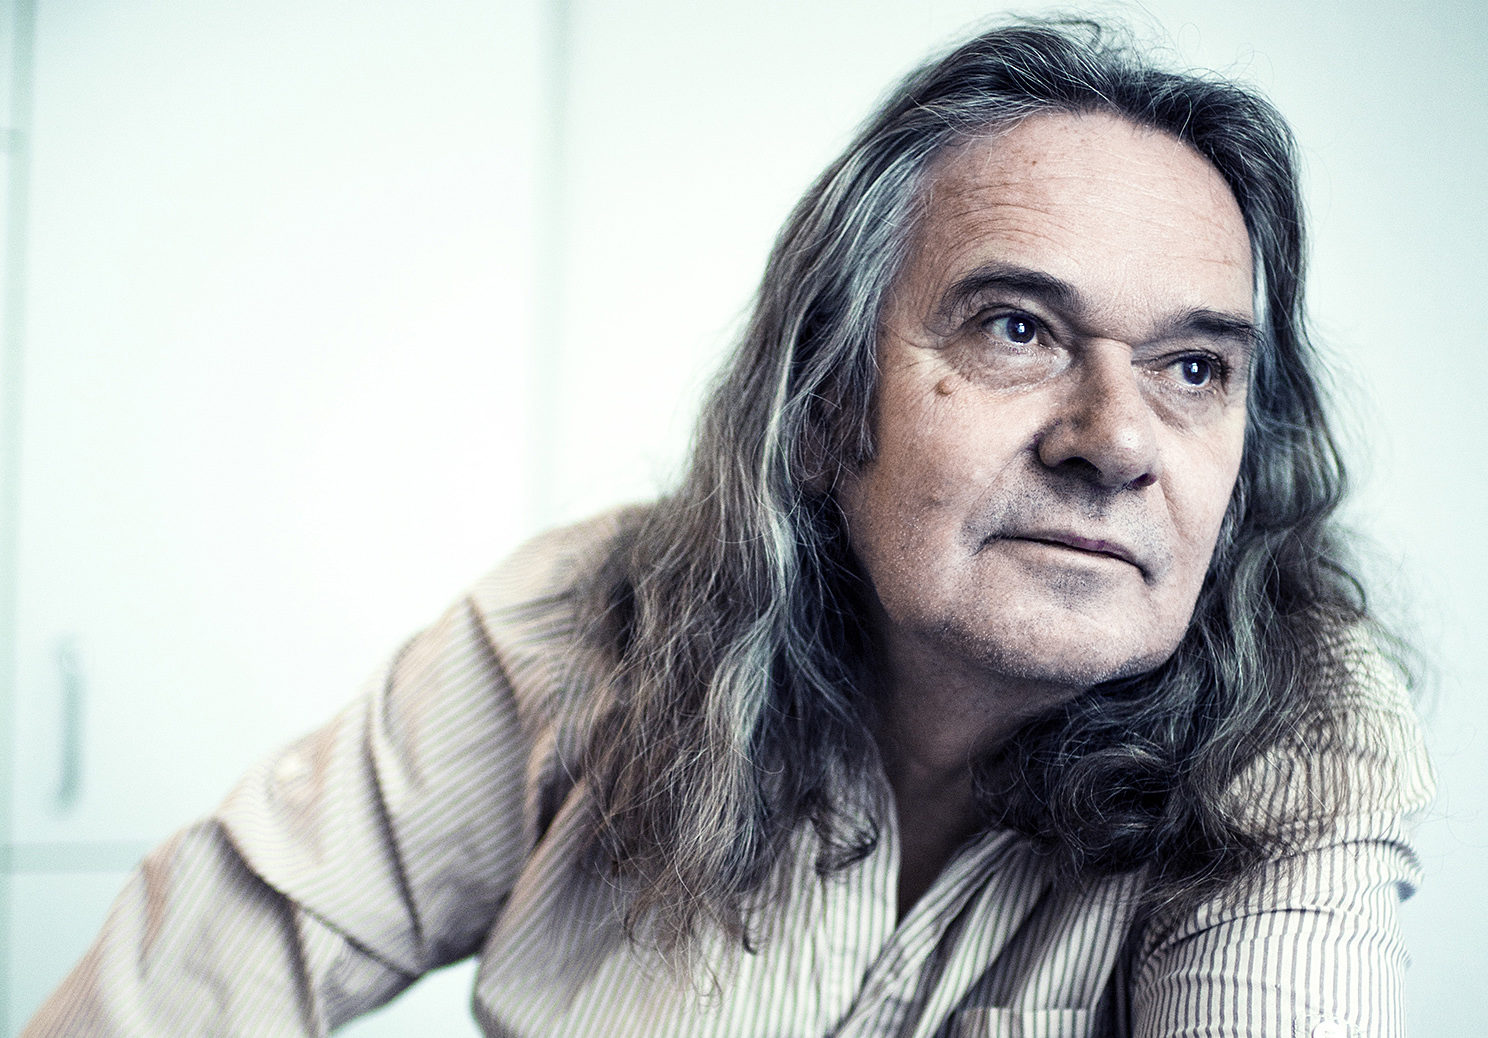 Ingvar Ambjørnsen Marie Sjøvold Web